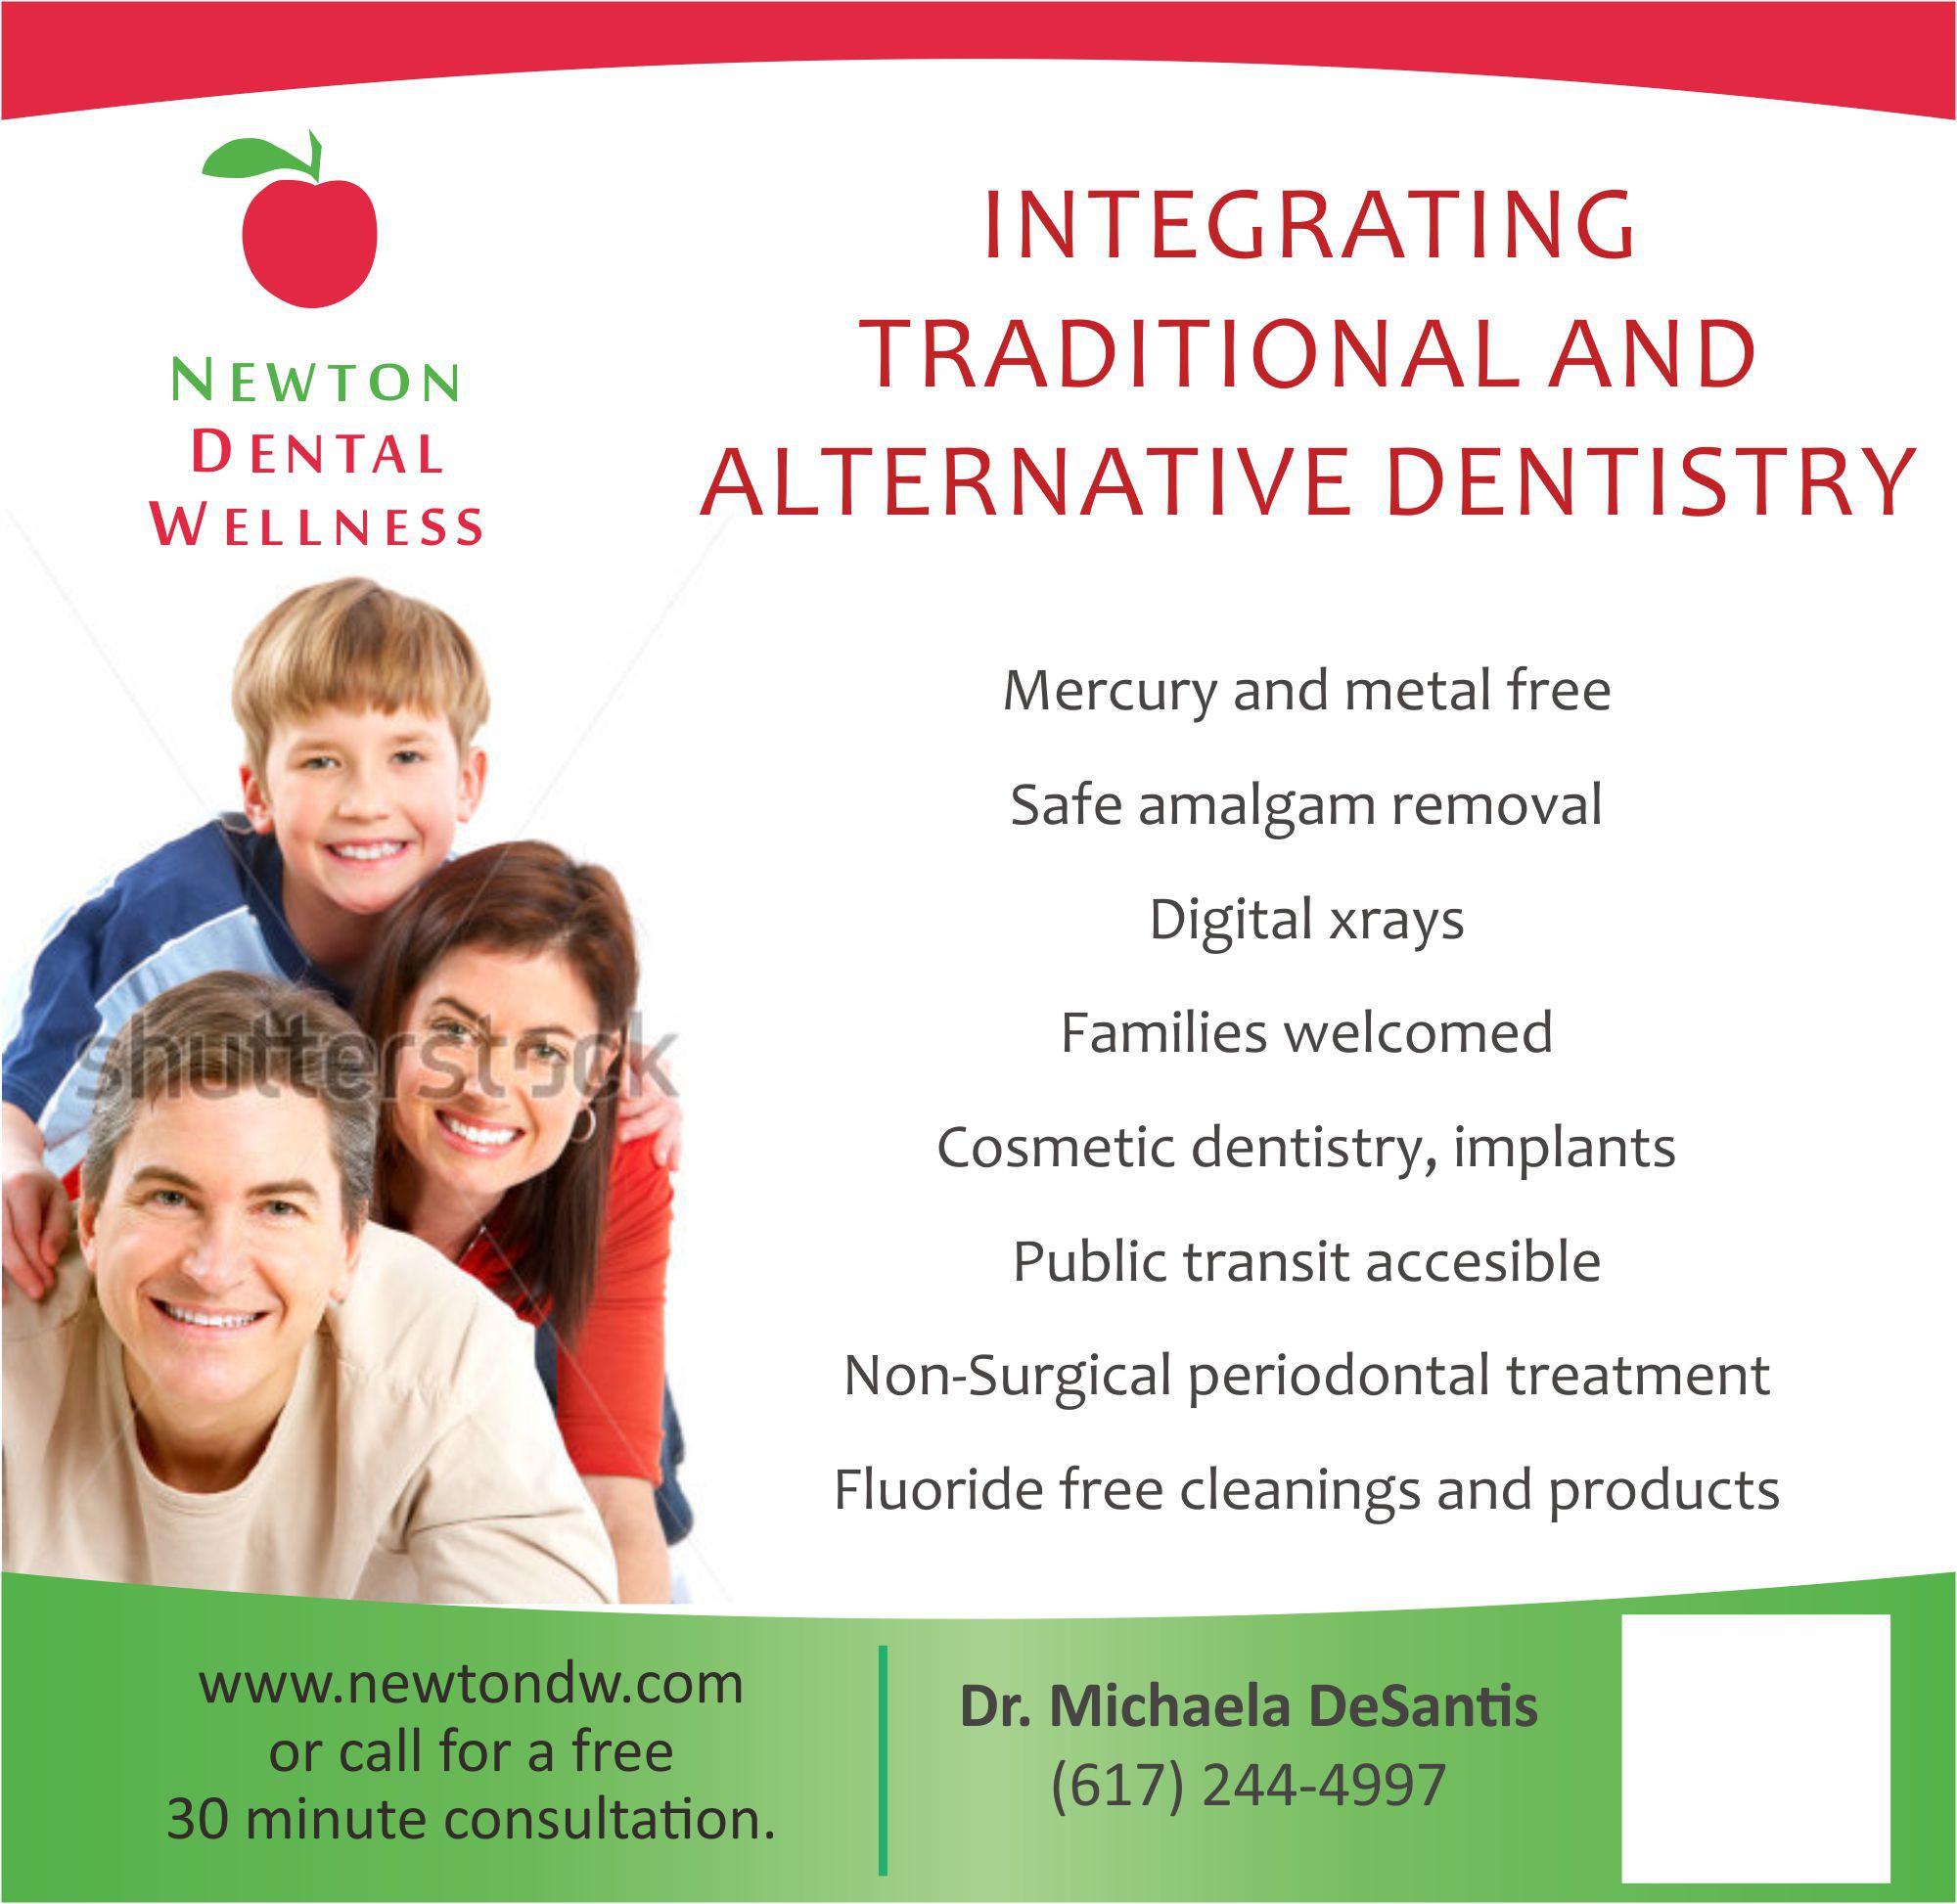 Create the next illustration for Newton Dental Wellness